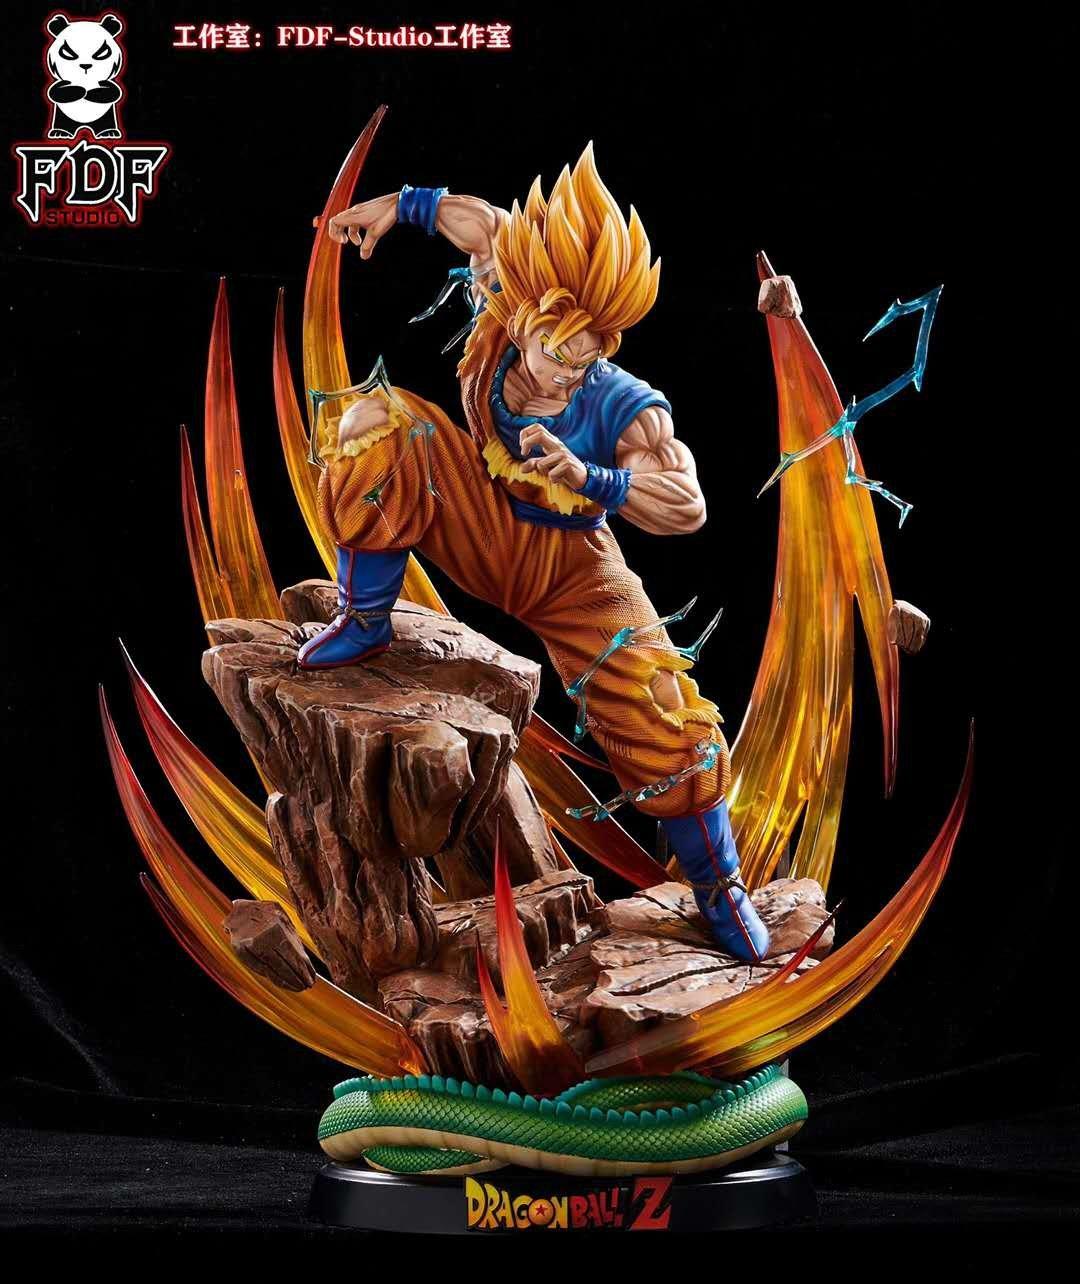 Image of [Pre-Order]Dragon Ball Z FDF Studio Goku 1:6 Resin Statue